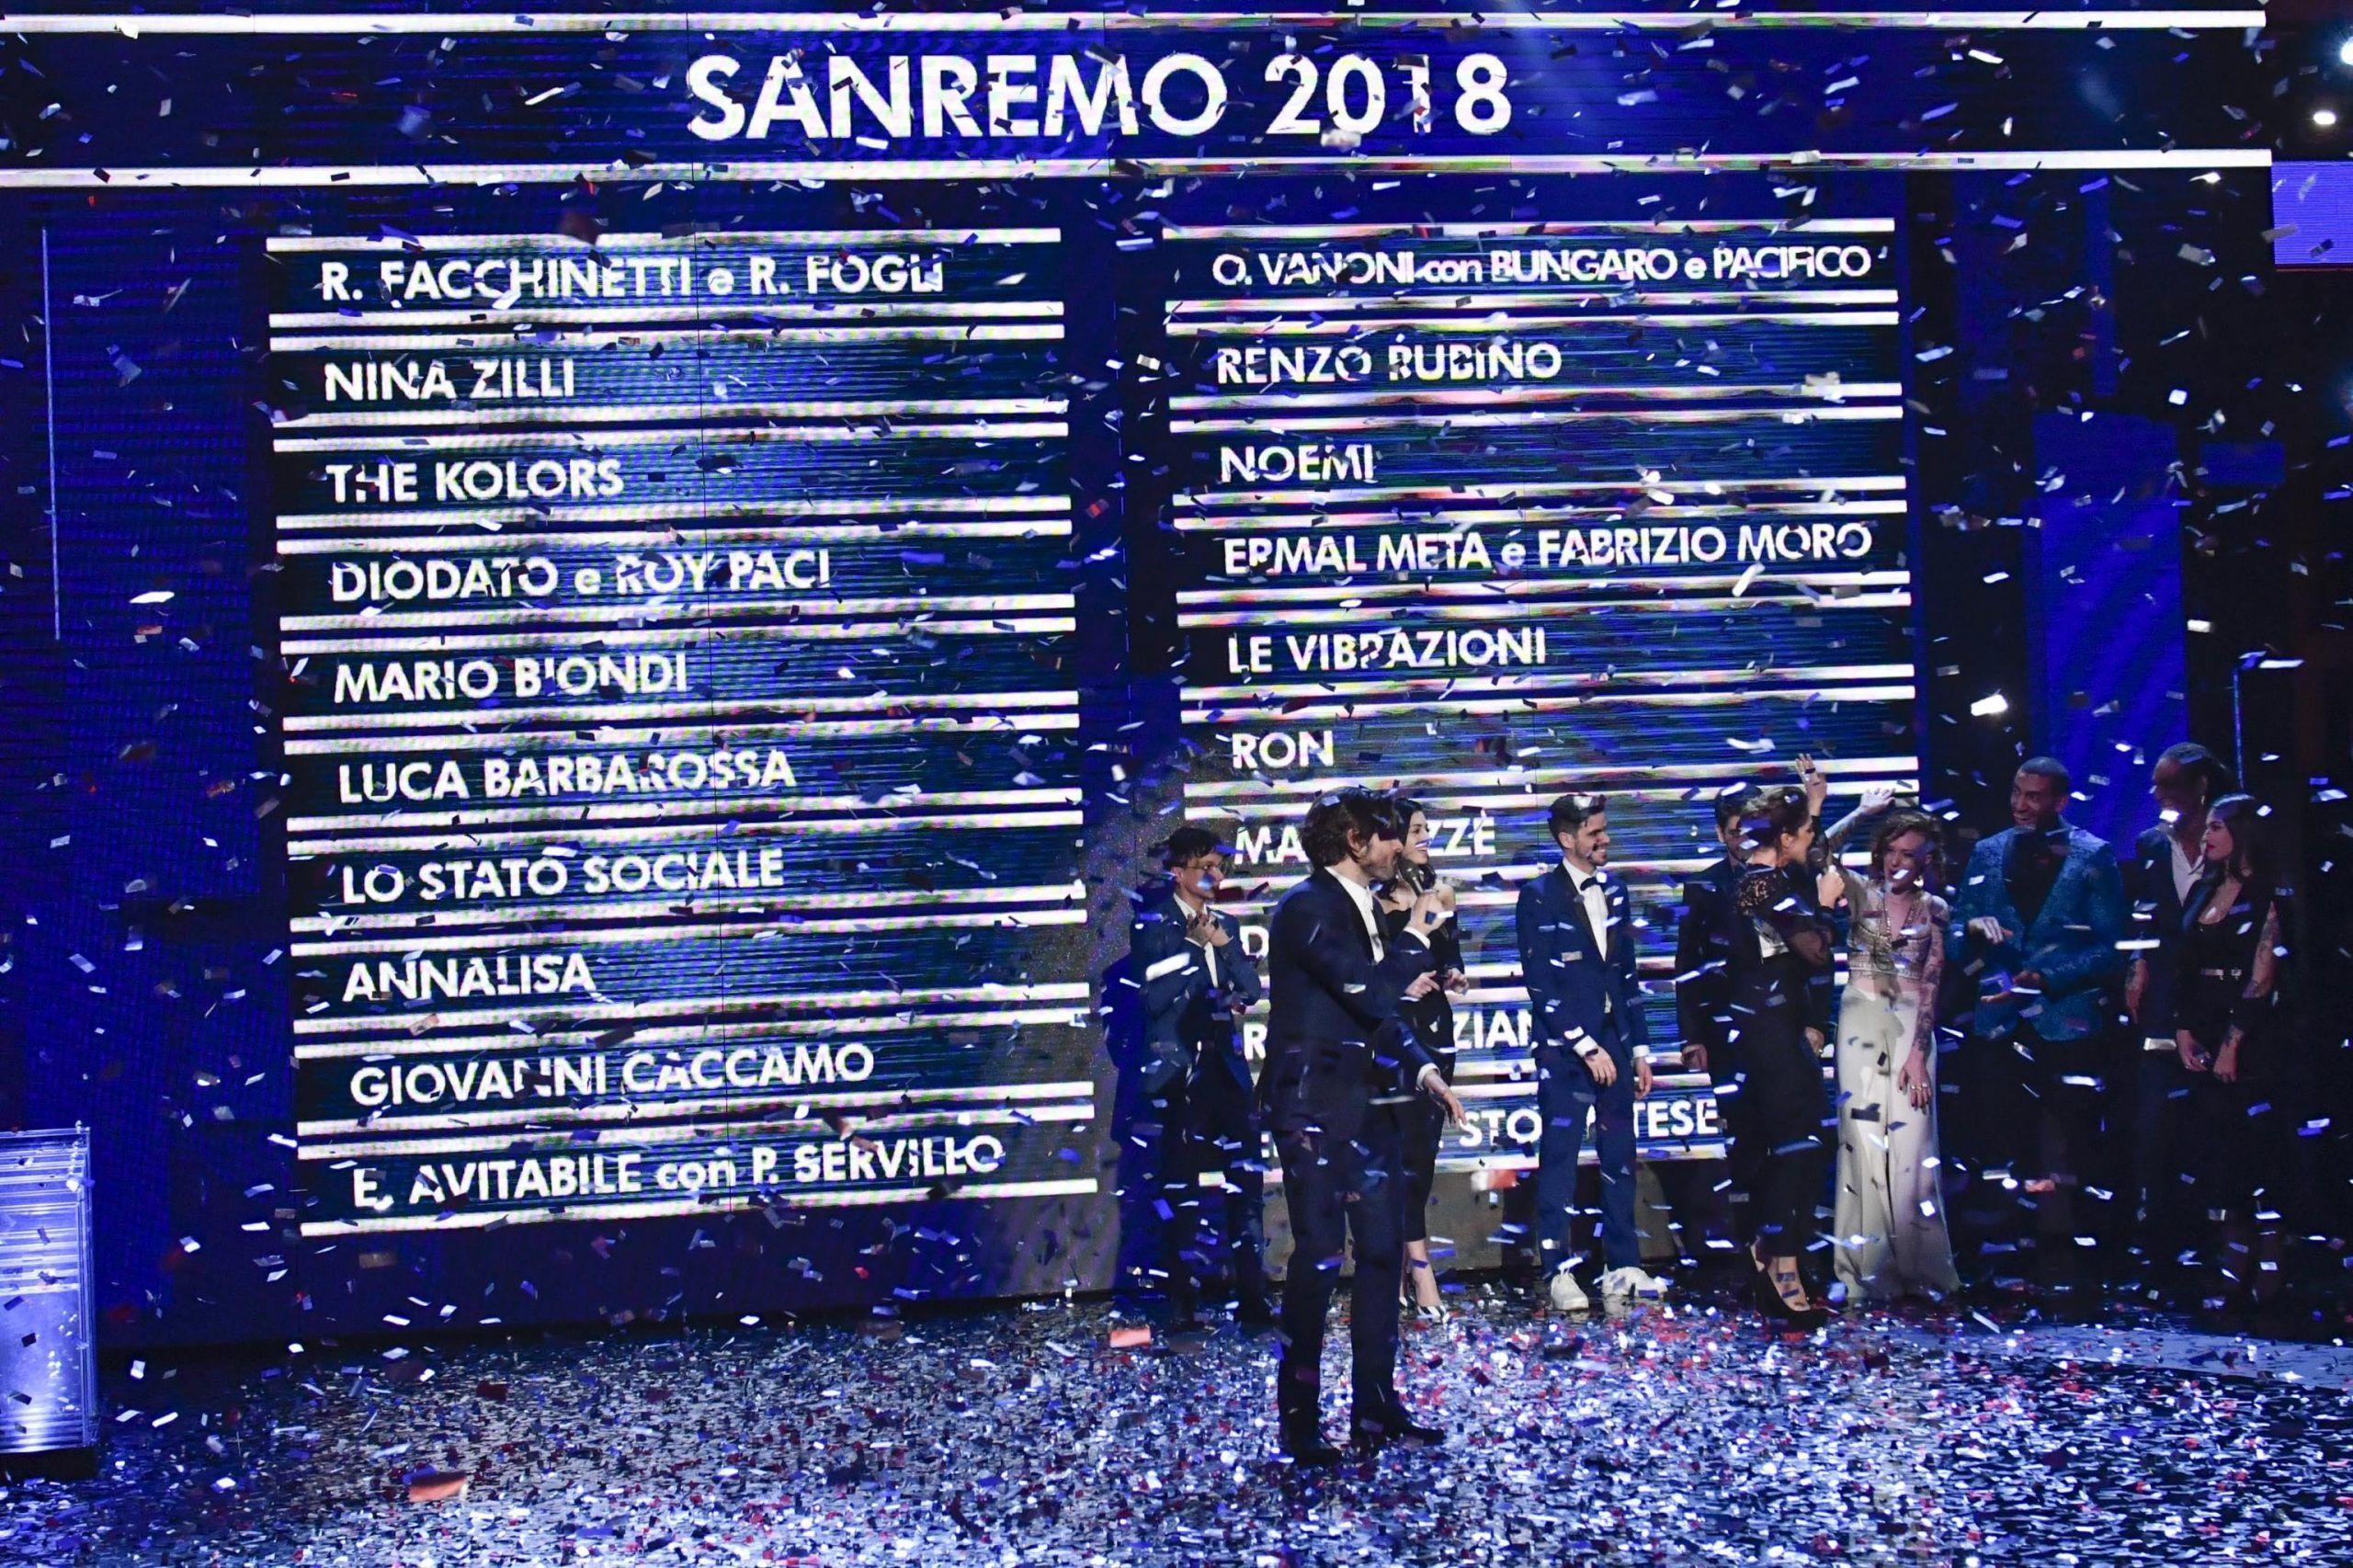 Tv: Rai1; 'Sarà Sanremo'